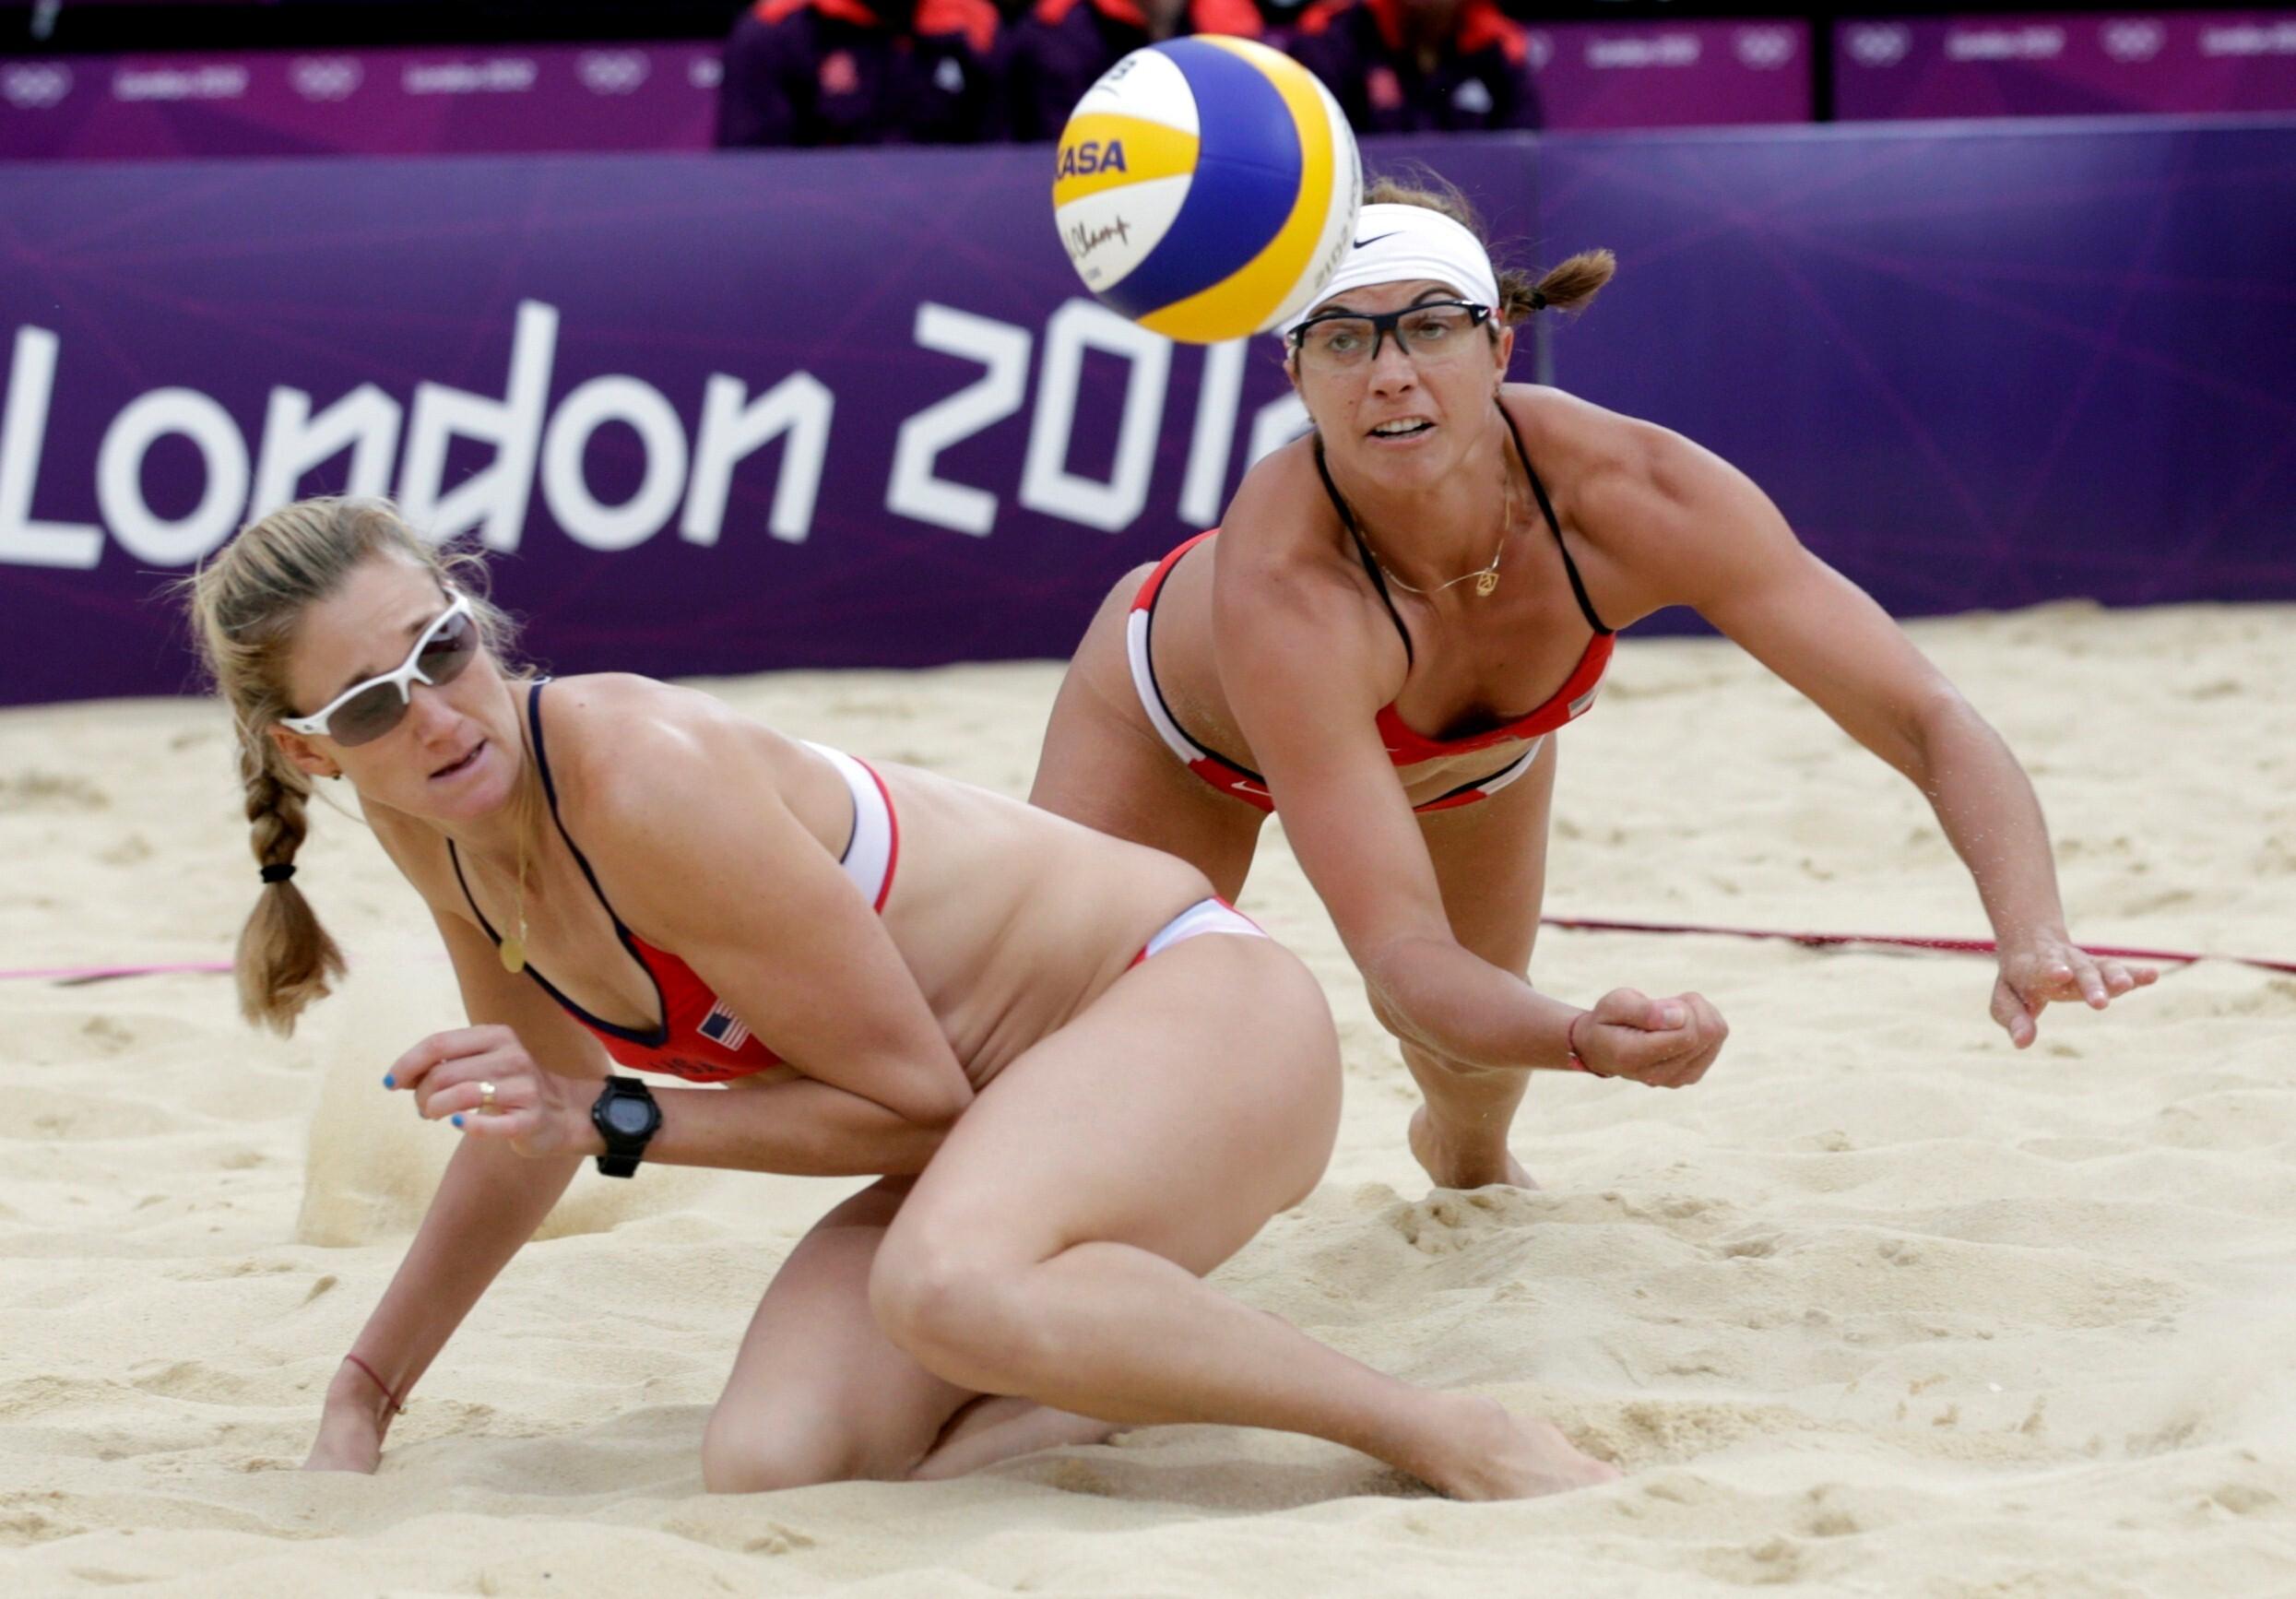 Sun porntube hot beach volleyball